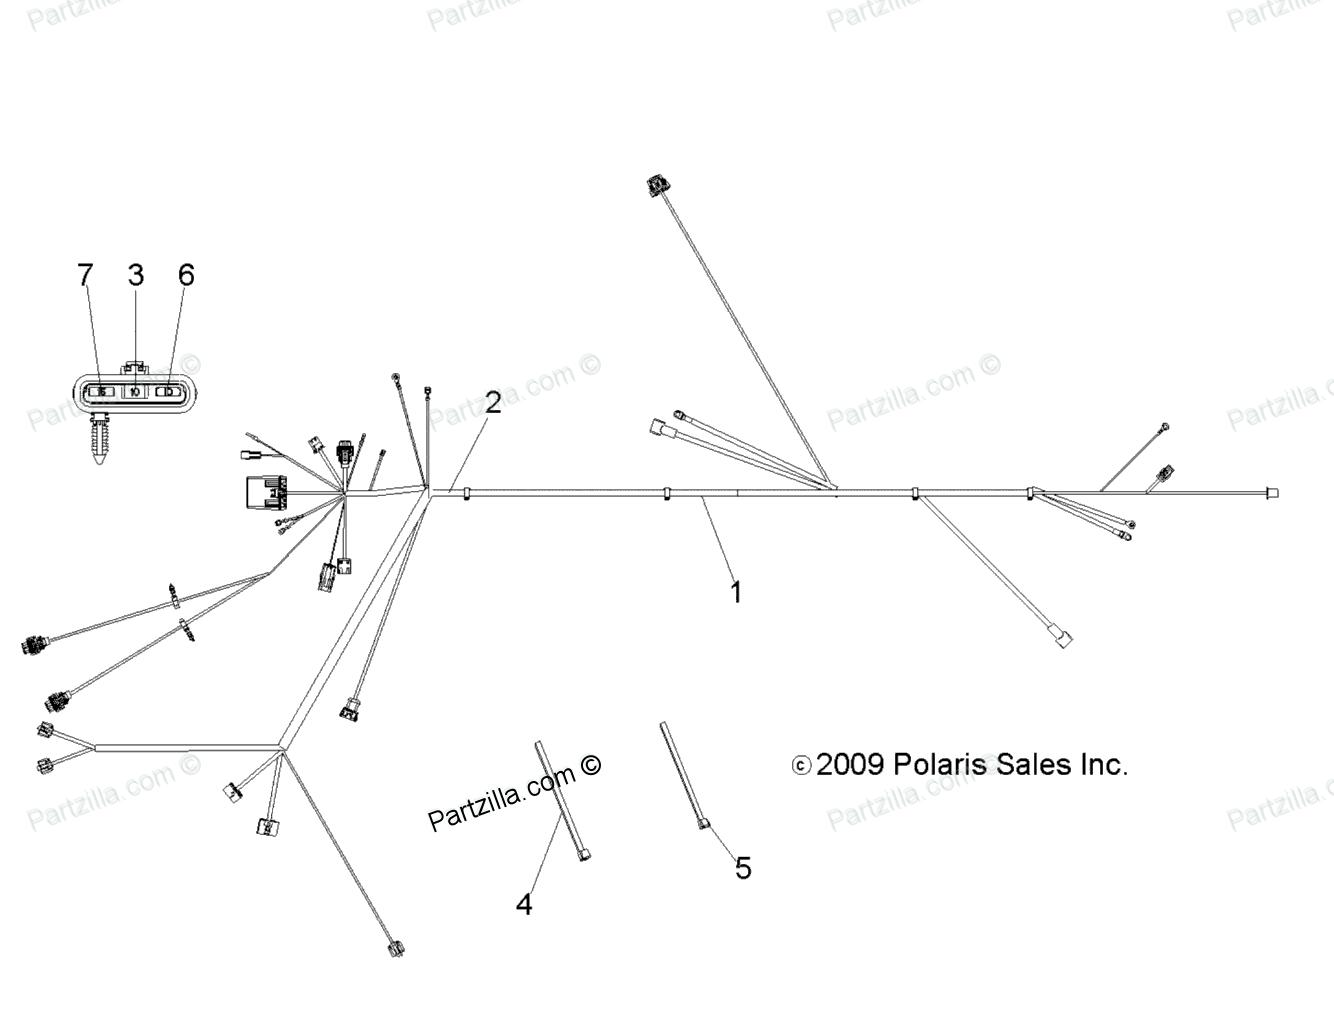 hight resolution of 06 trail boss 330 f4e854439b82023ff5c6bfe38de25814f1349939 png